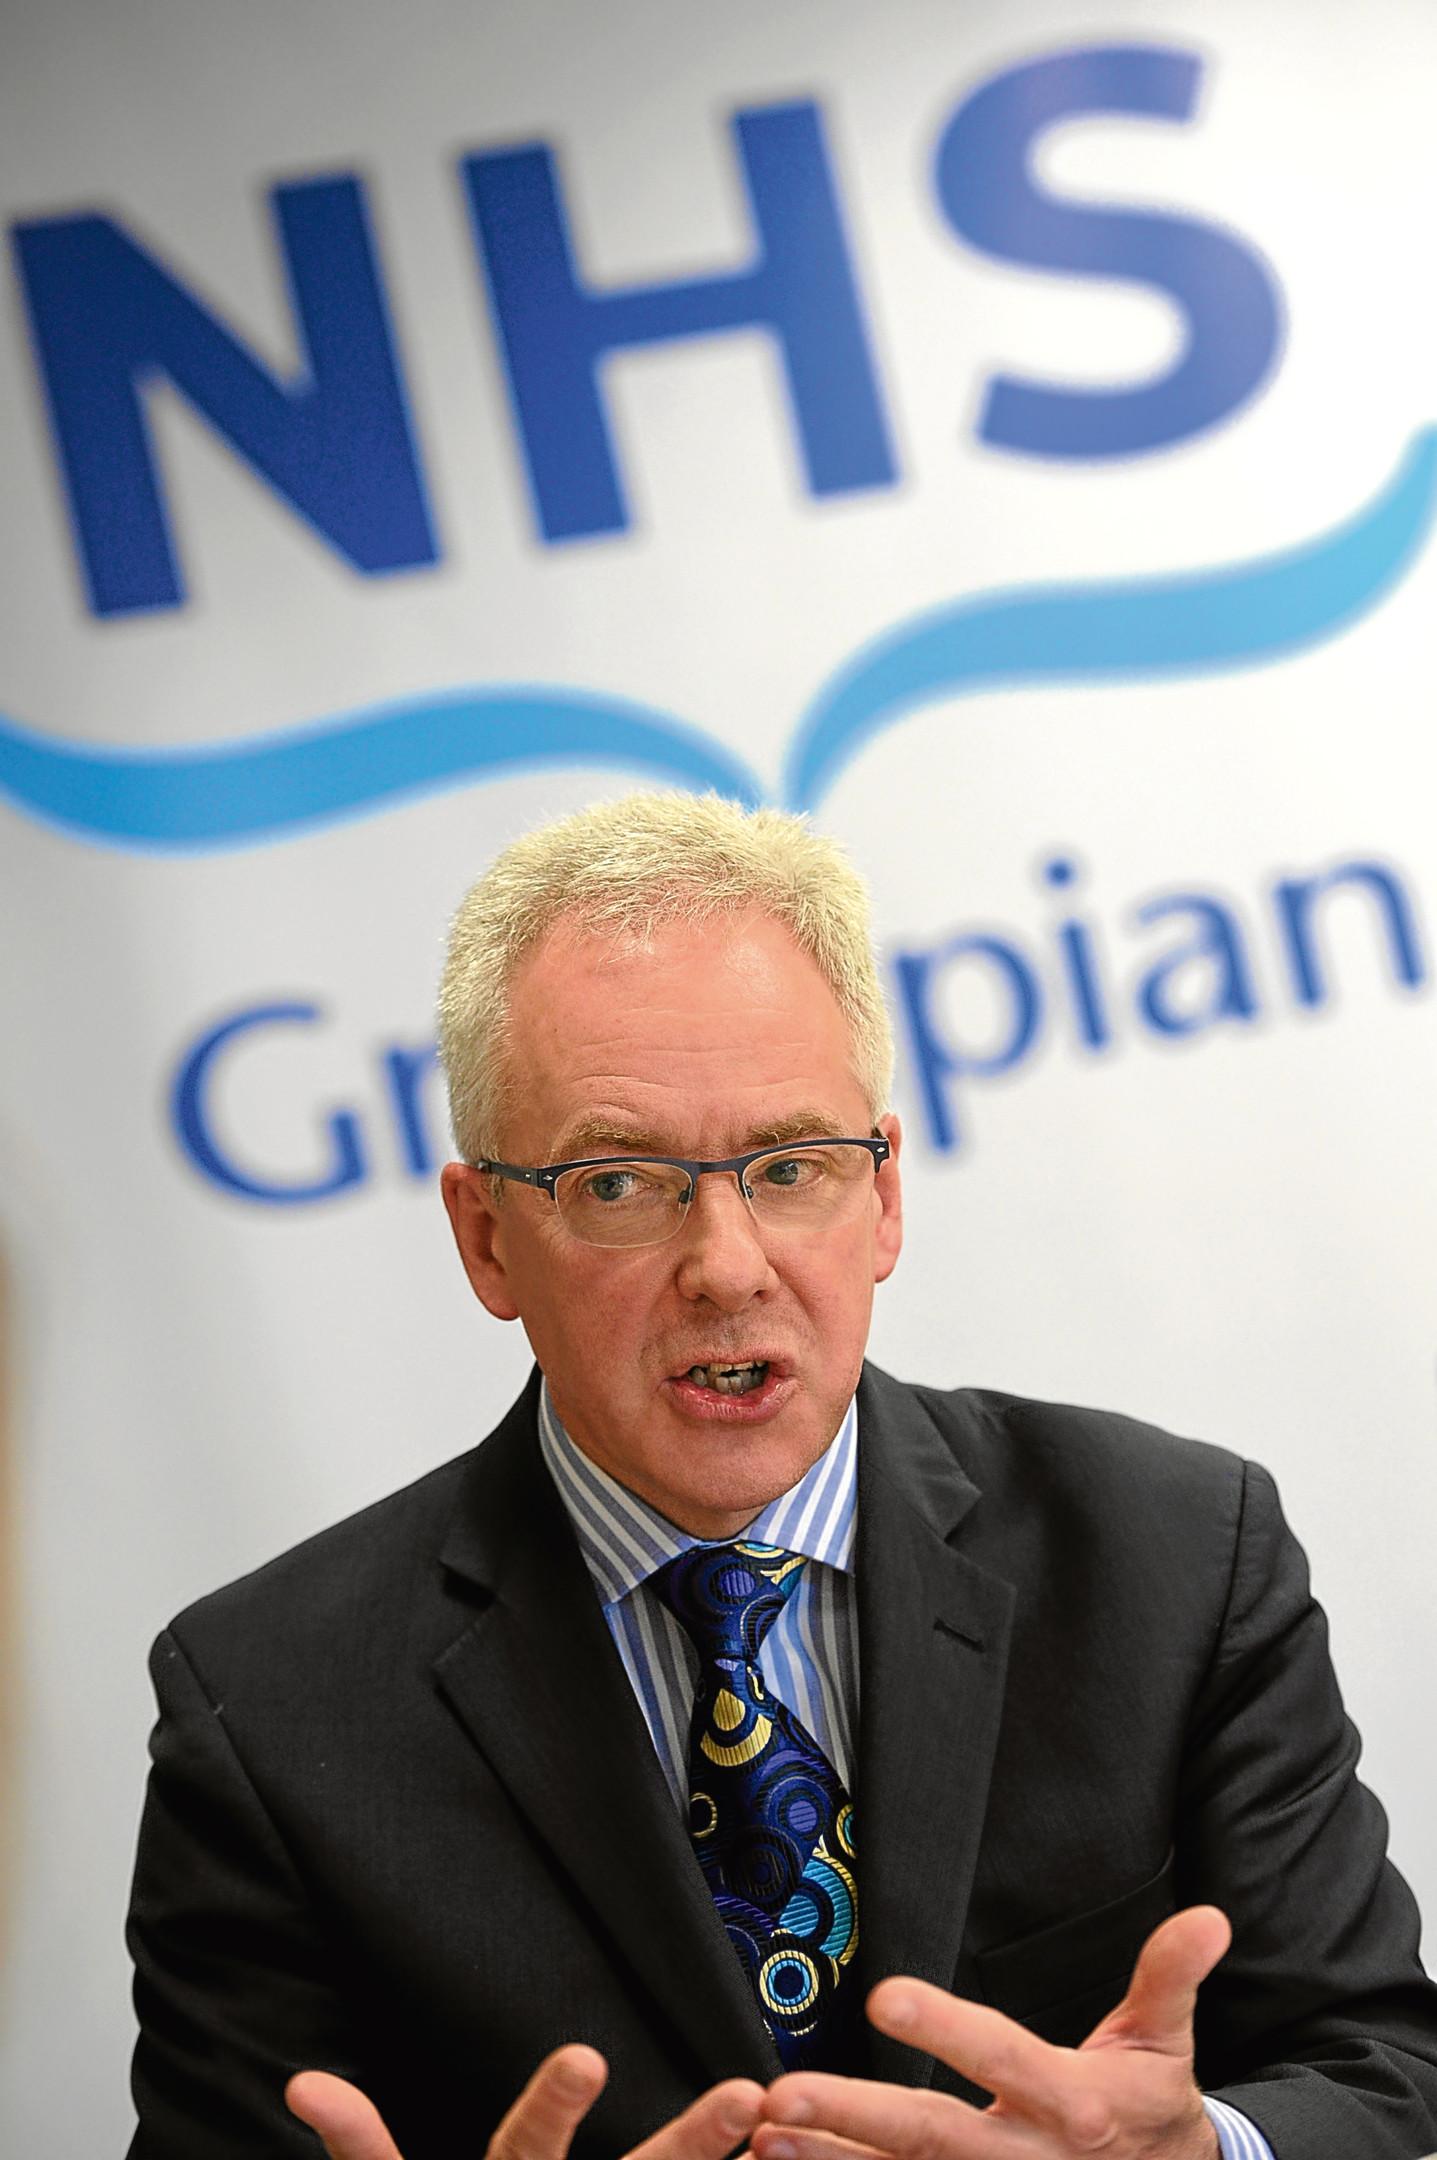 NHS Grampian chief executive Malcolm Wright